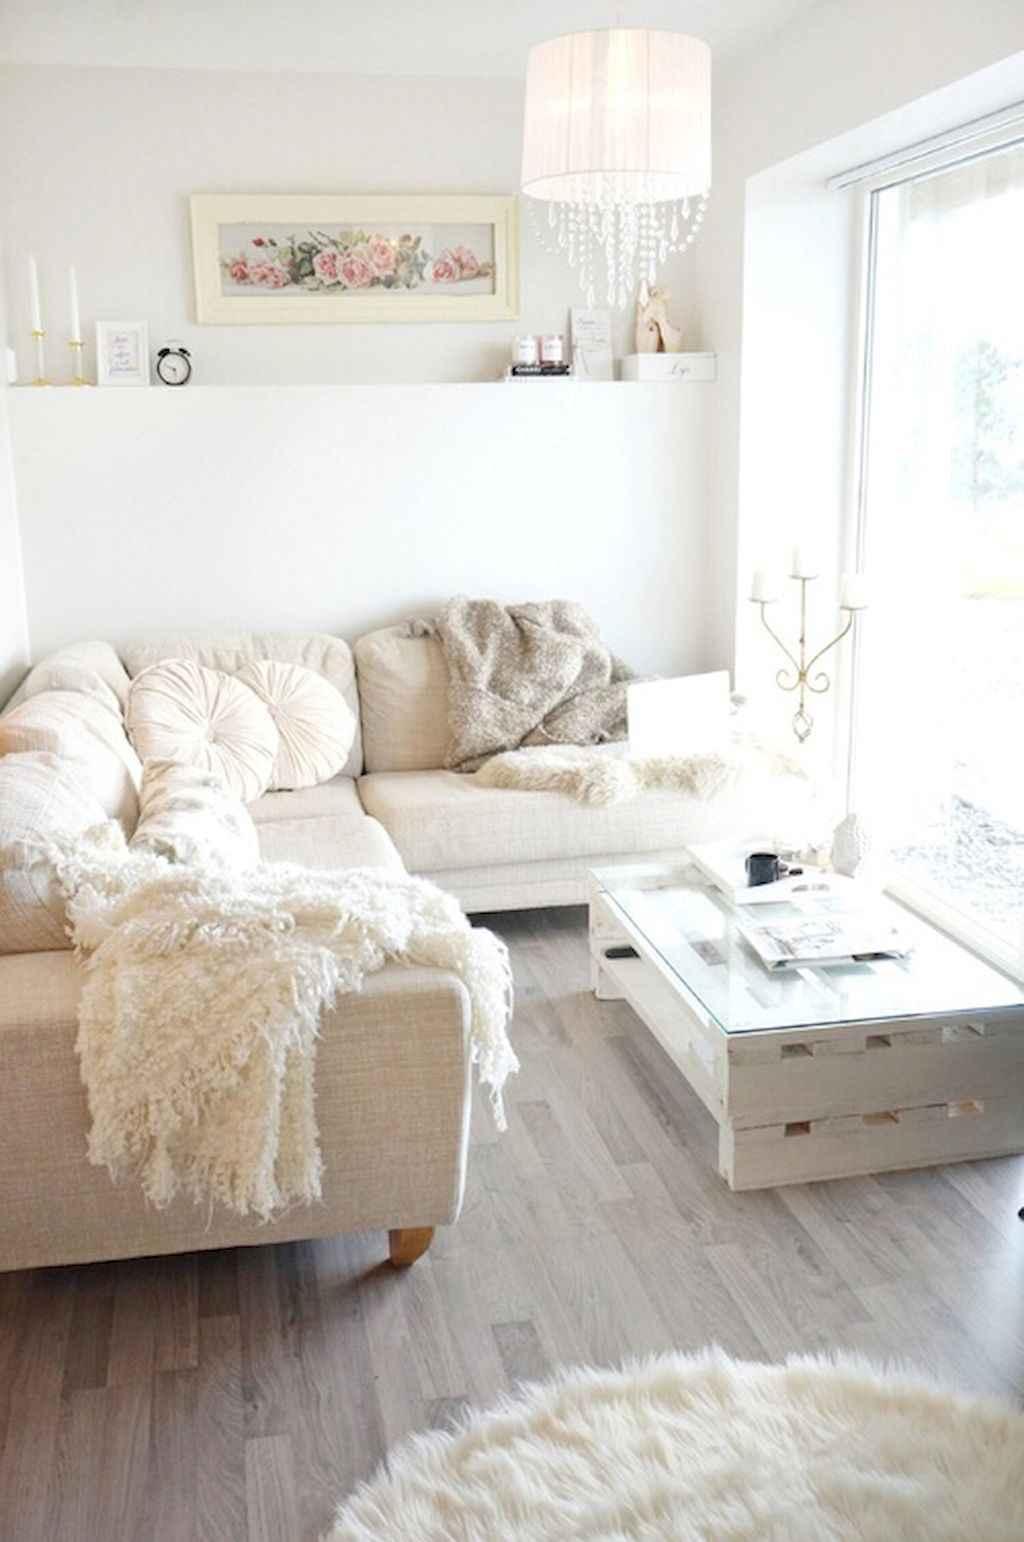 Romantic shabby chic living room decoration ideas (19)